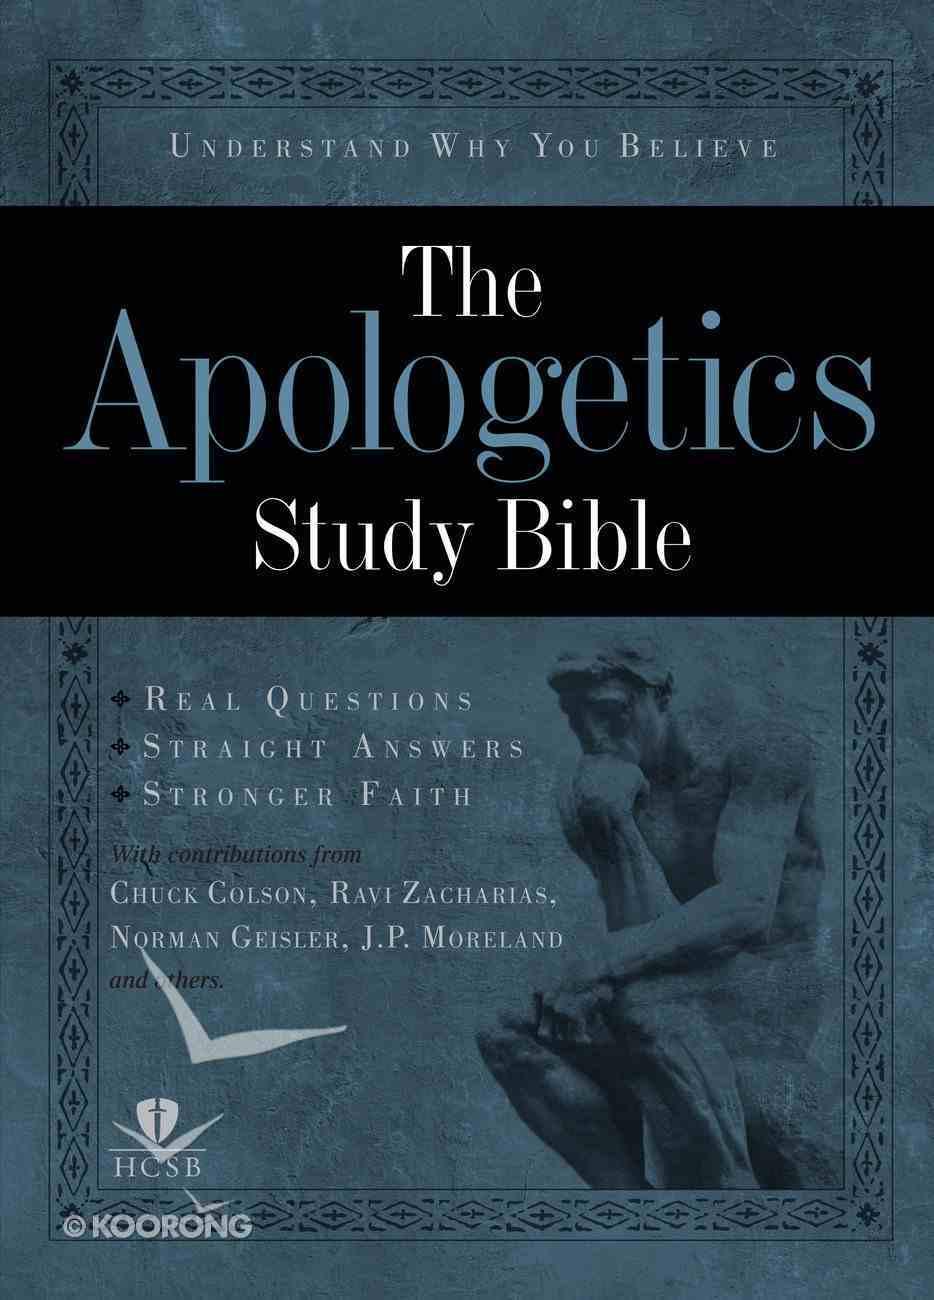 HCSB Apologetics Study Bible eBook